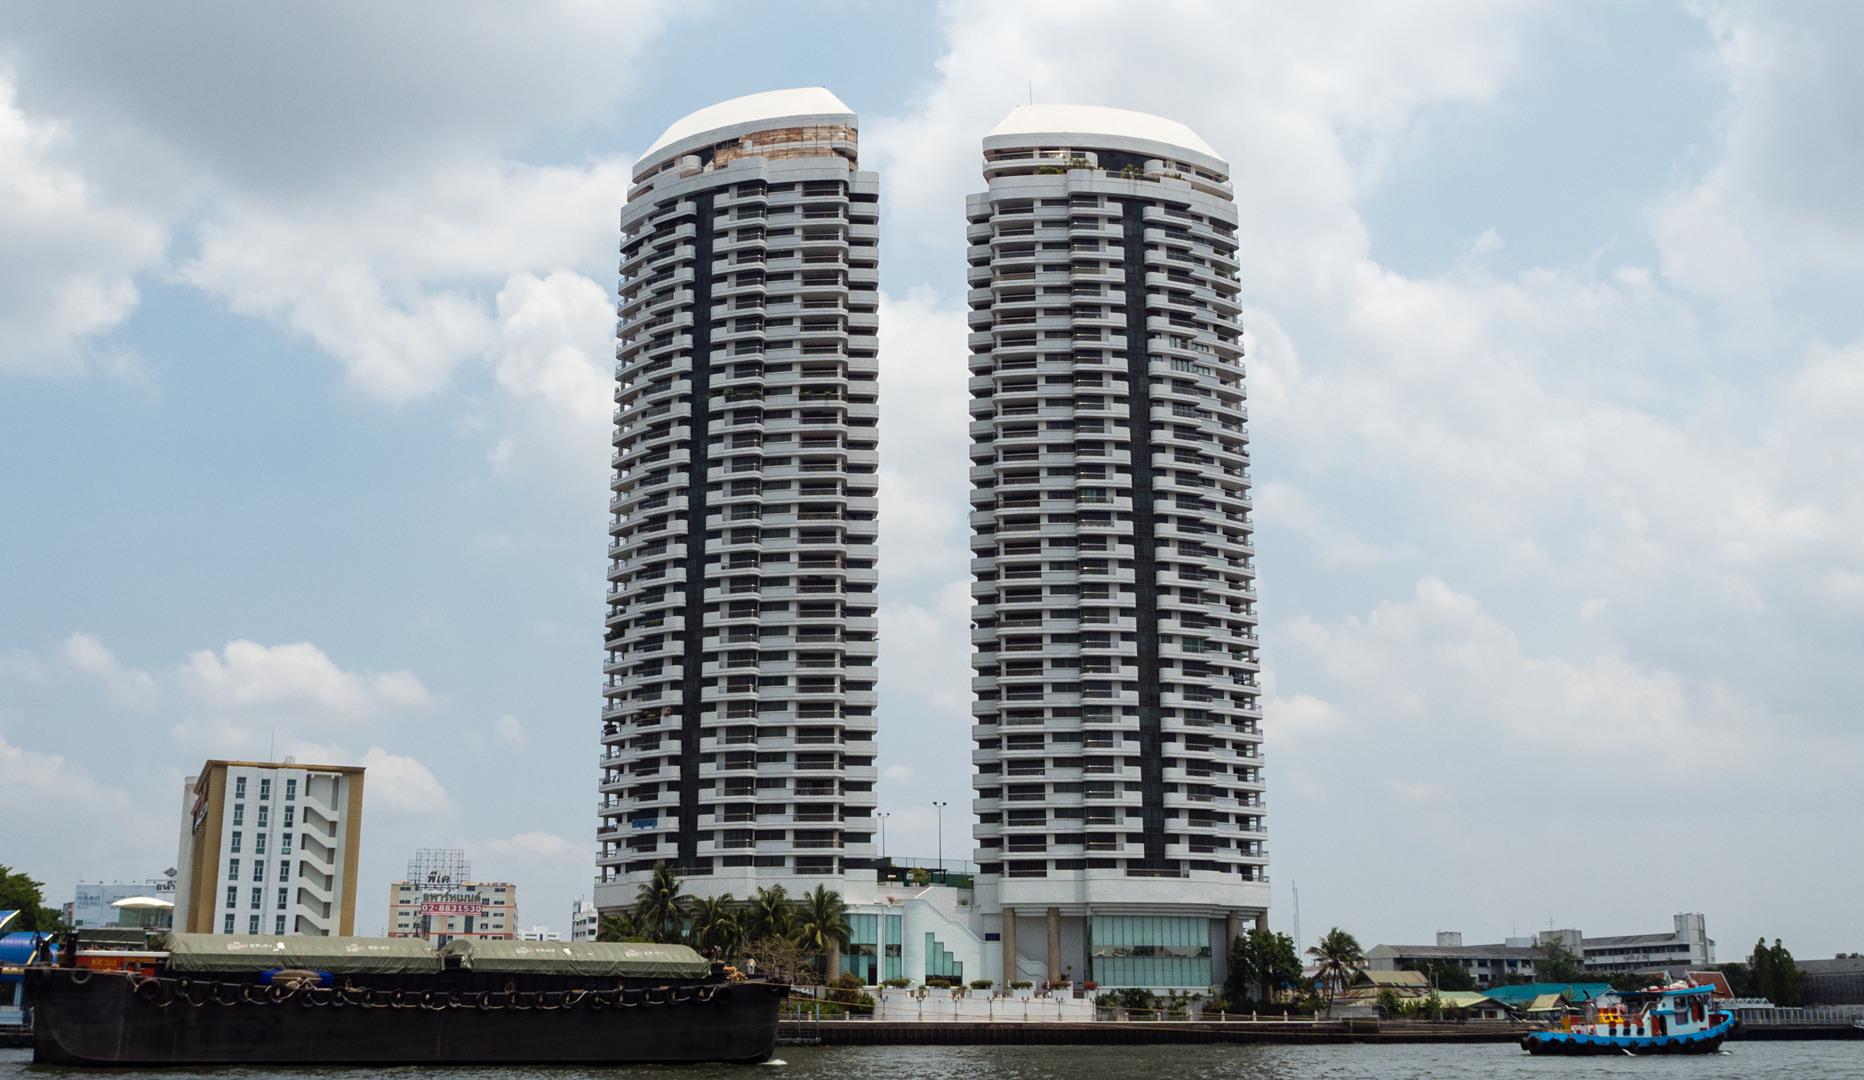 Somdet Phra Pinklao, Бангкок